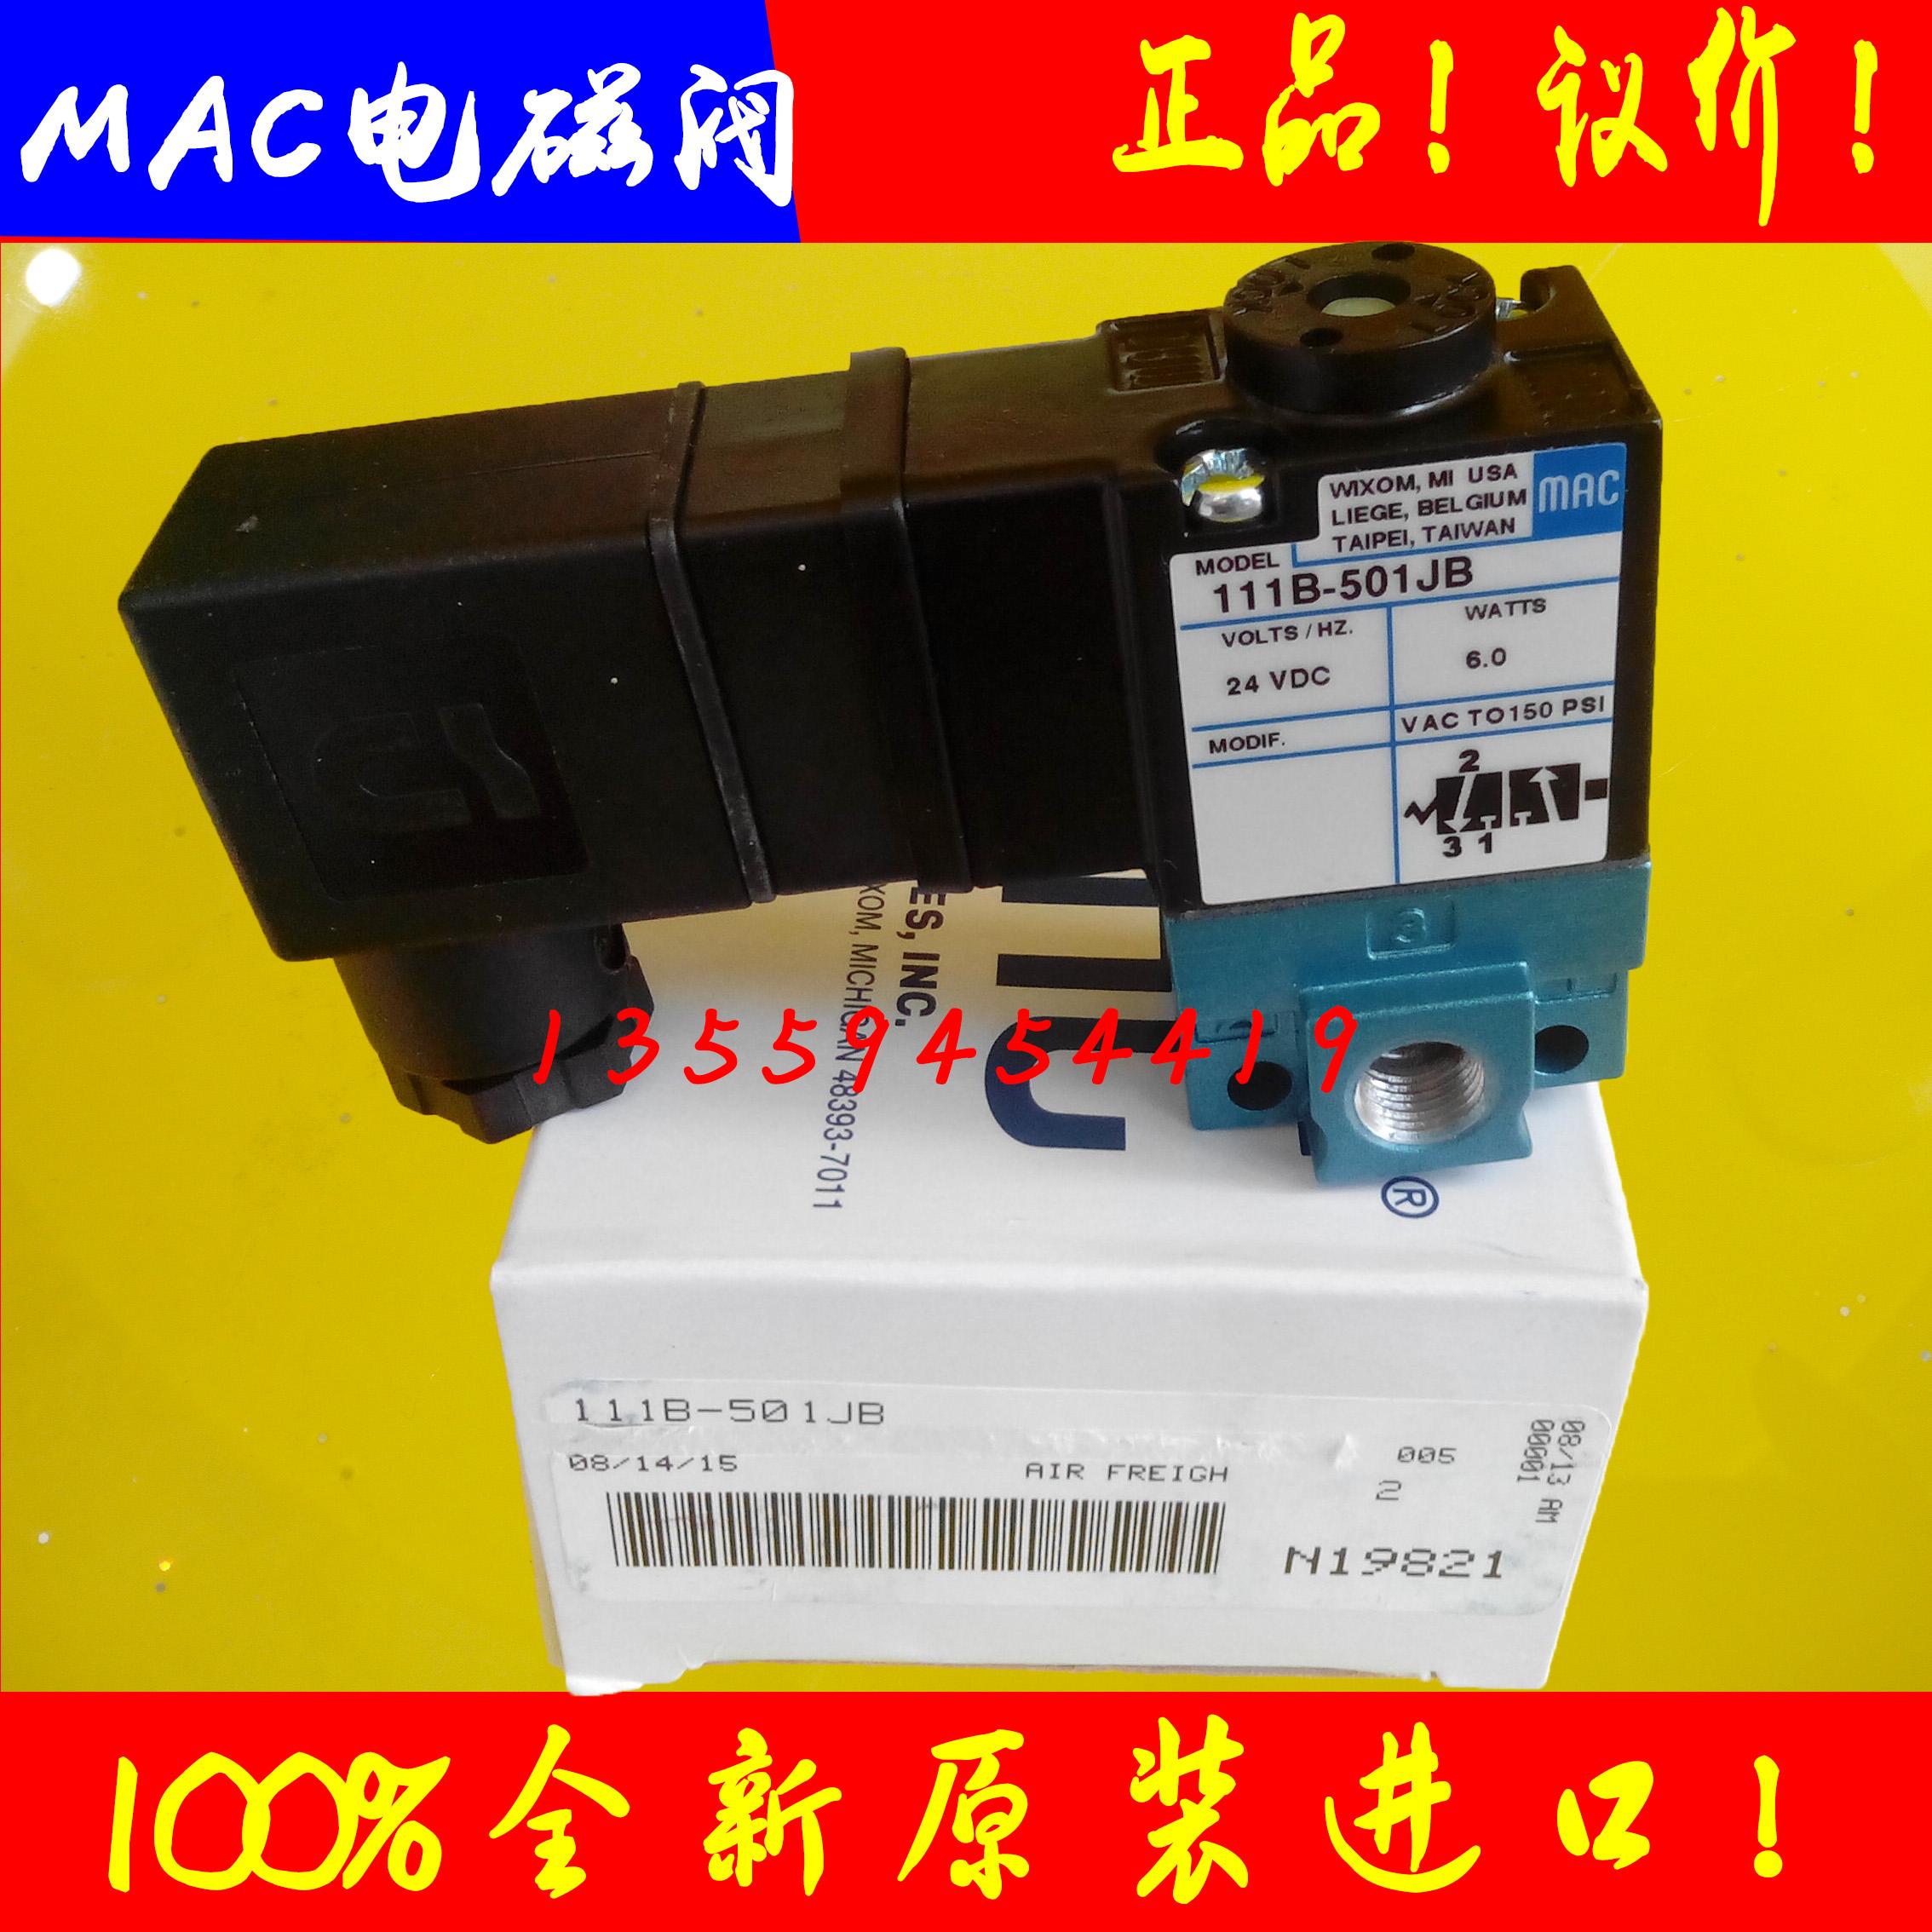 100% original genuine American MAC solenoid valve 111B-501JB fake one penalty ten spot mail package bargaining